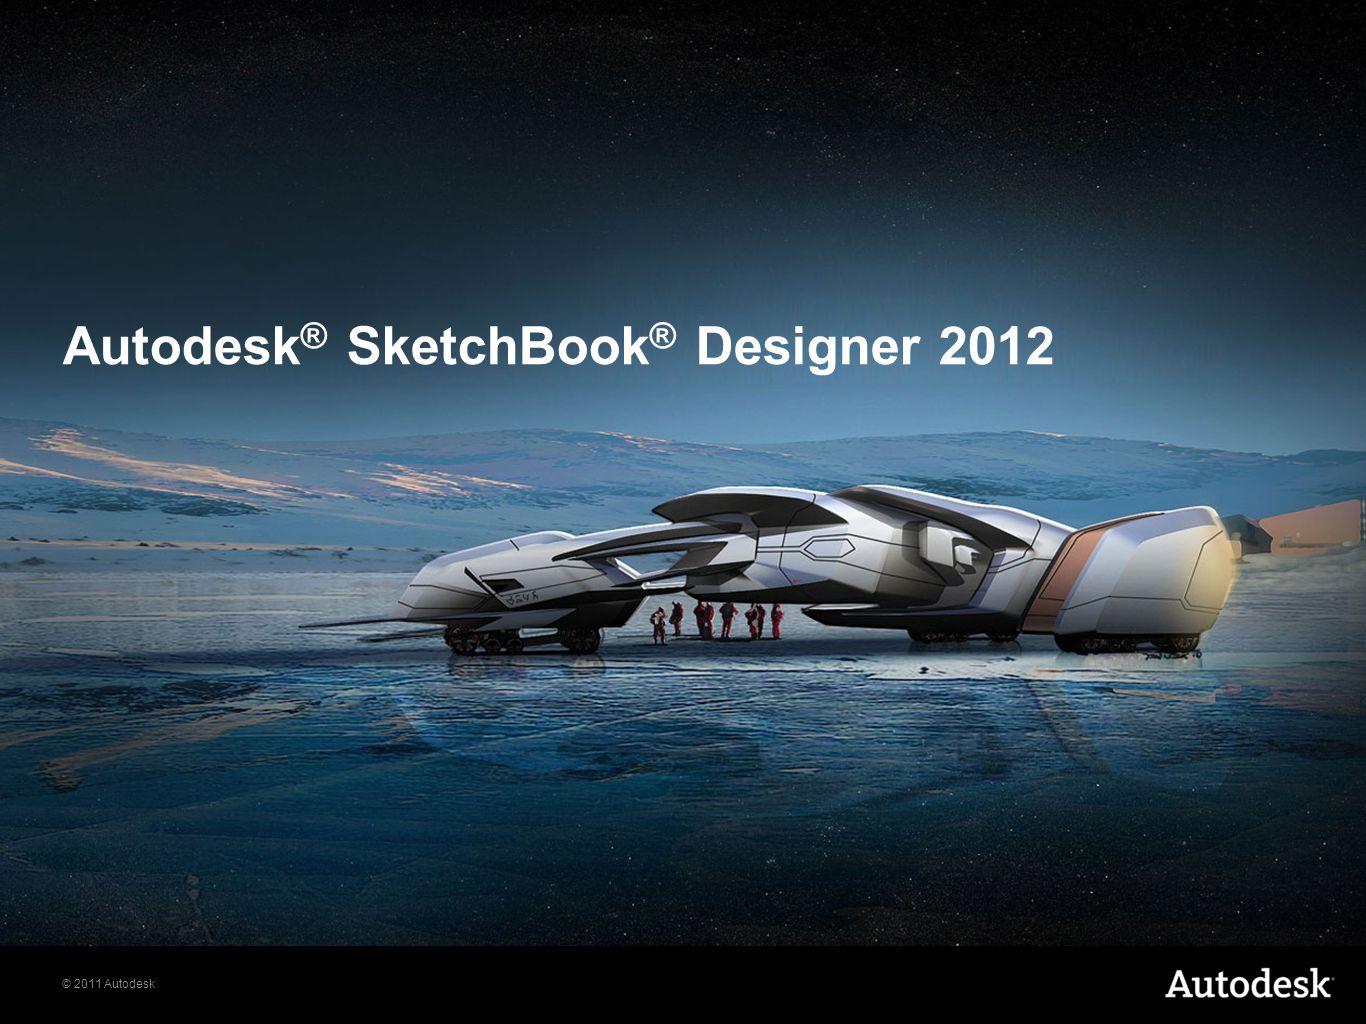 © 2011 Autodesk Autodesk ® SketchBook ® Designer 2012